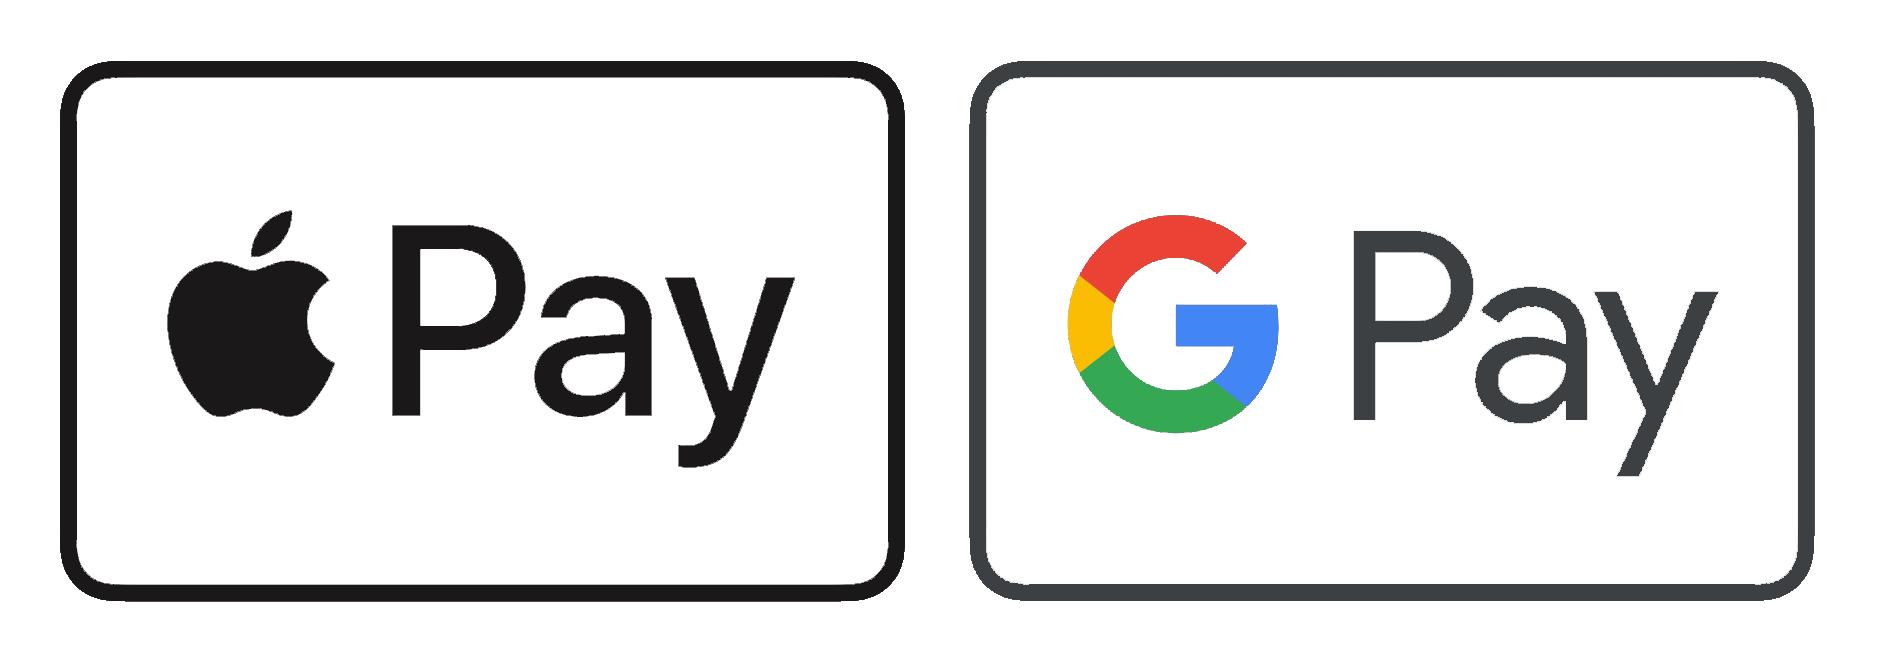 Aple Pay/Google Pay